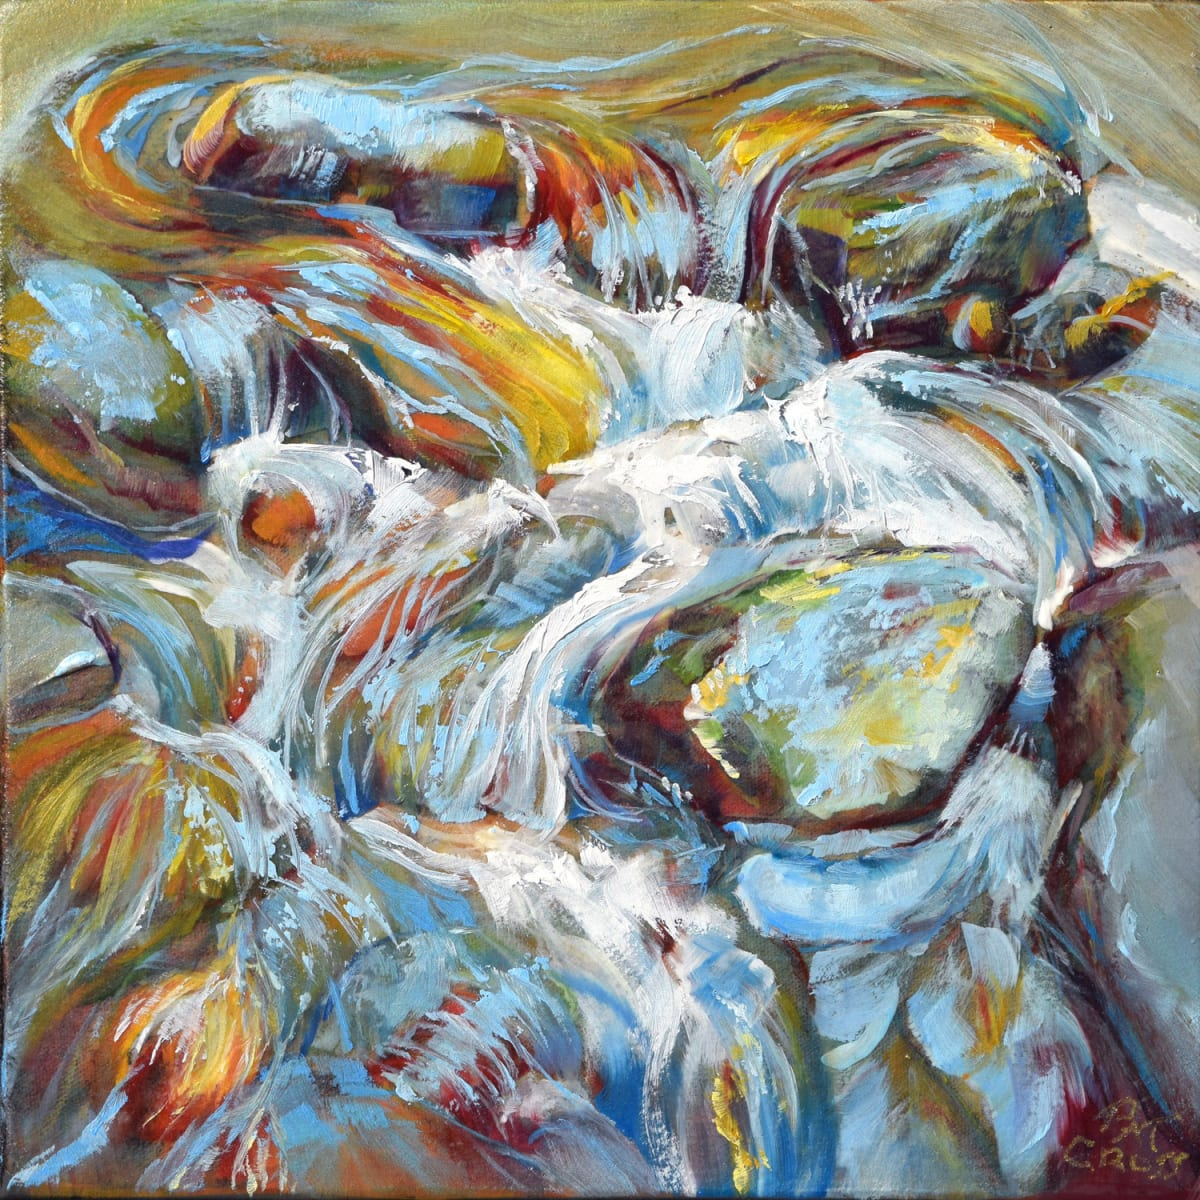 River Rock Music by Pat Cross